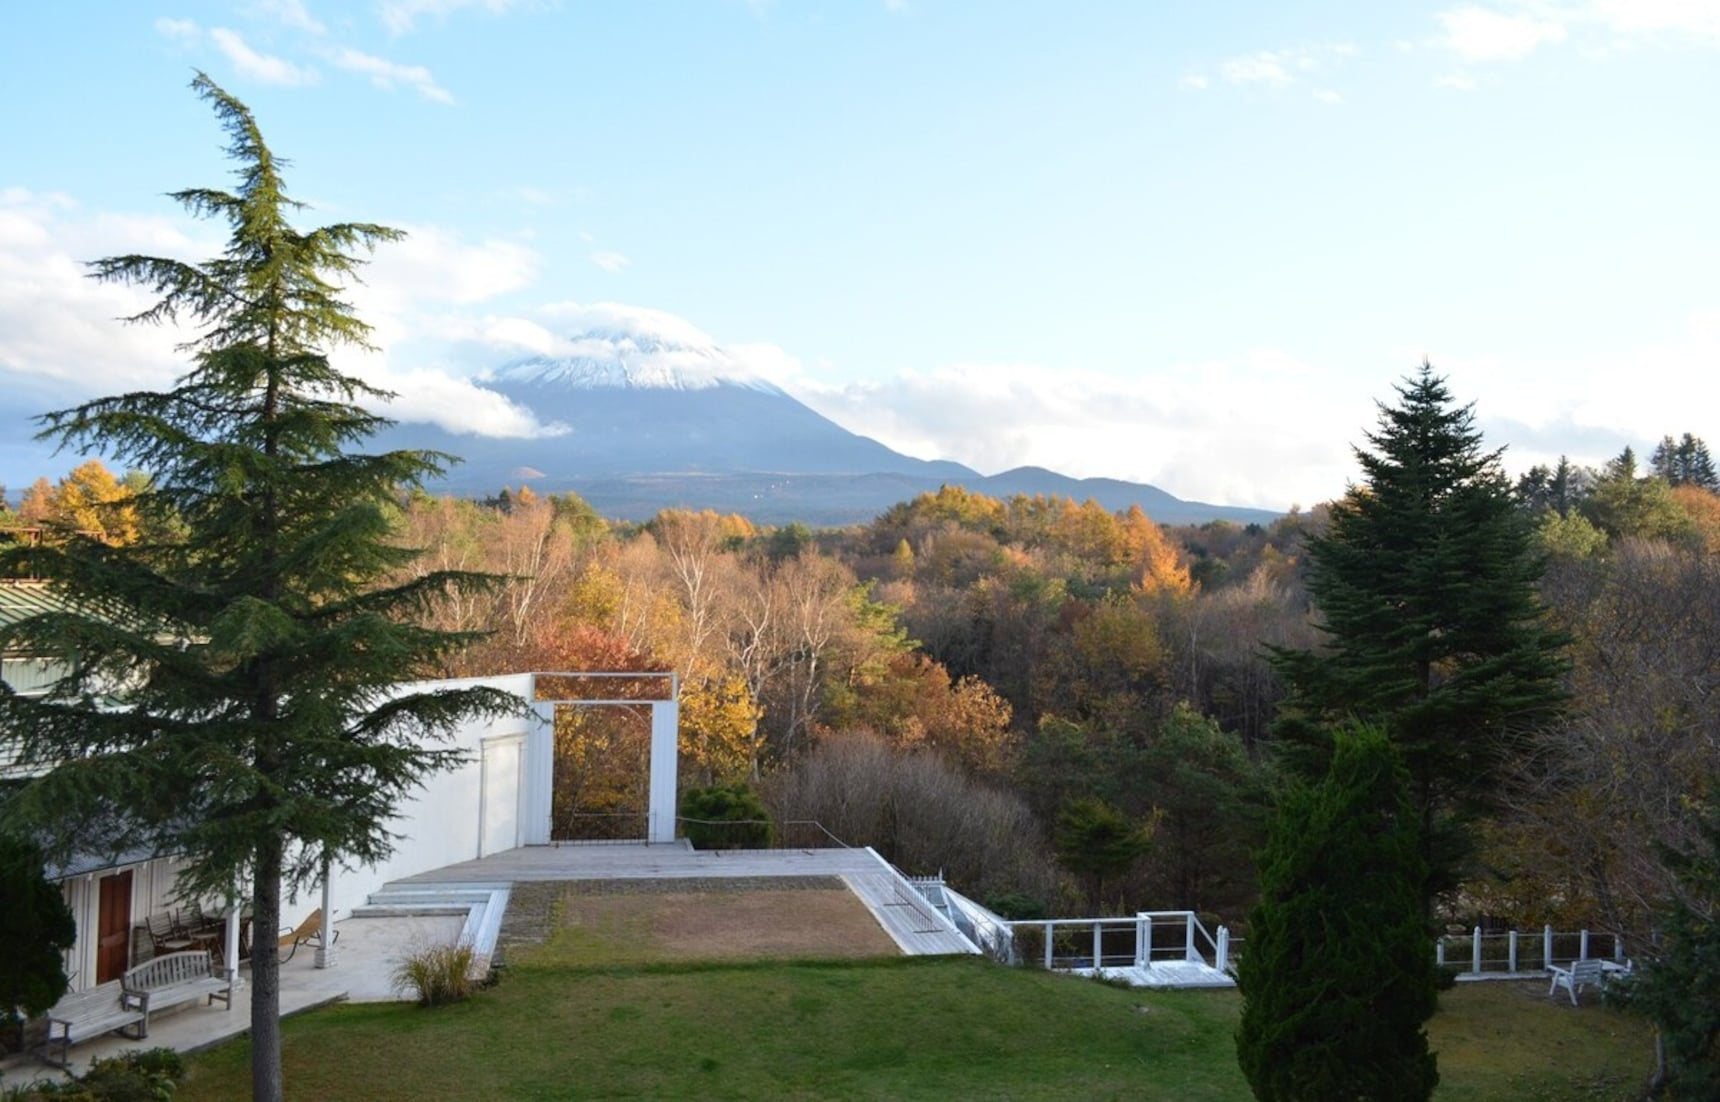 Top 11 Airbnb Vacation Rentals Near Mount Fuji